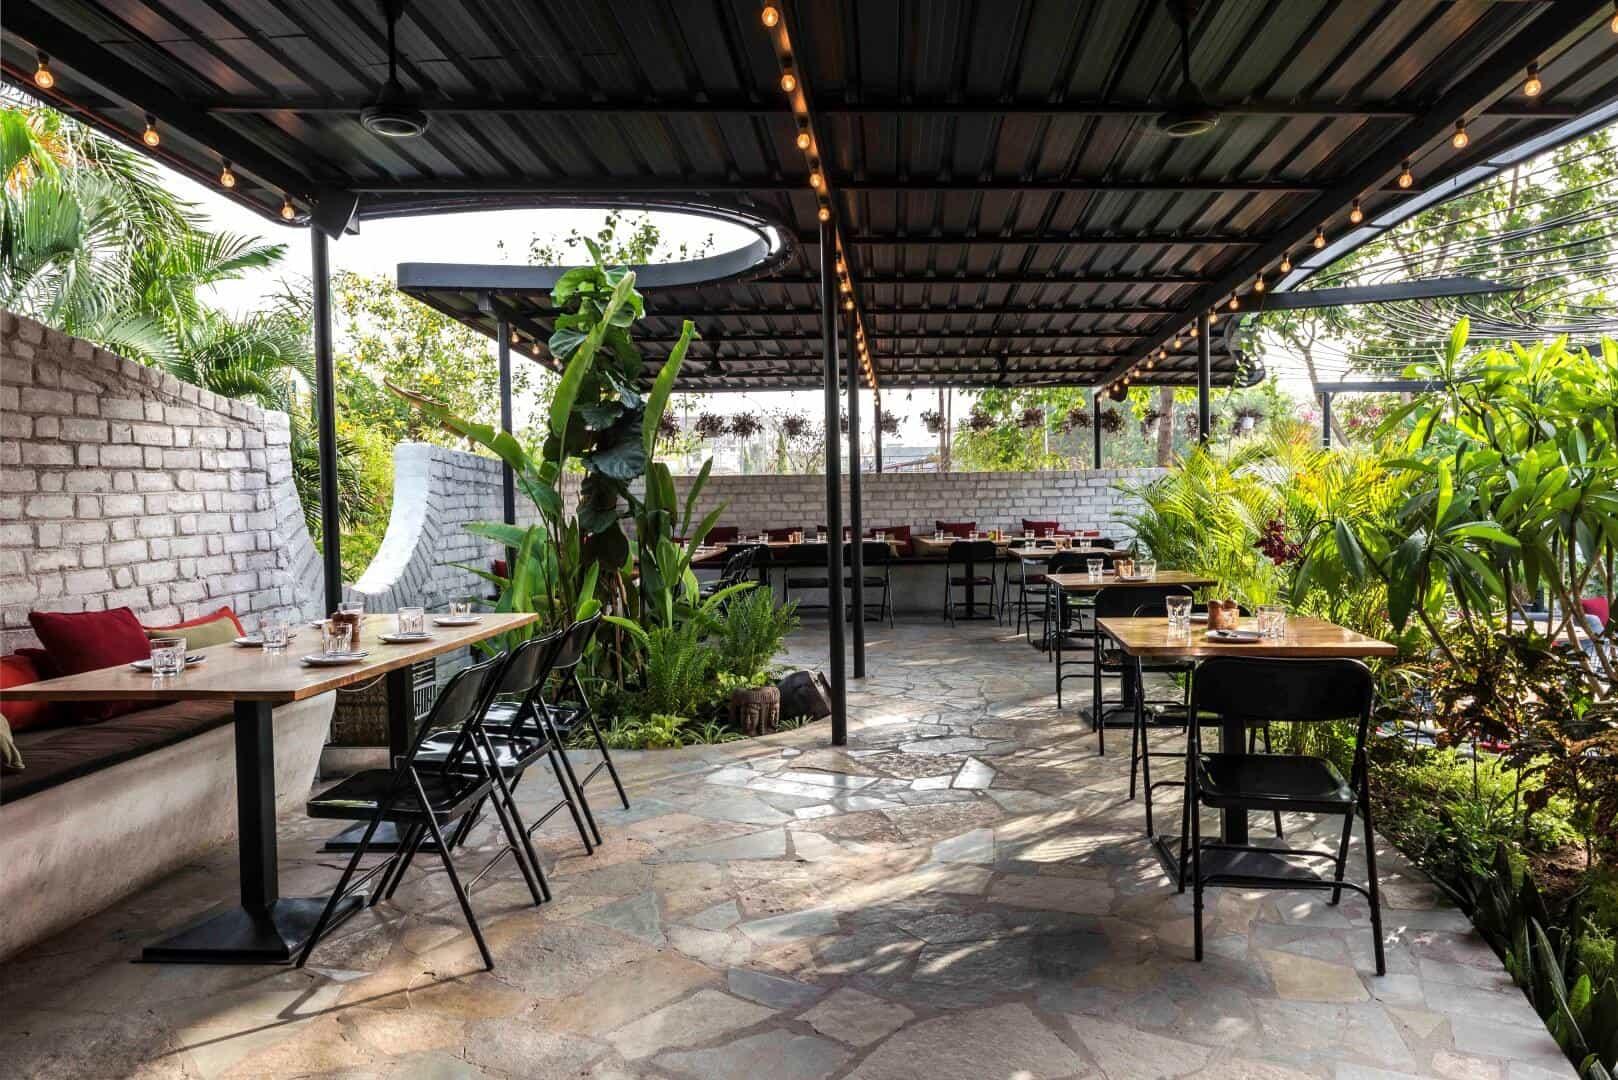 Sensational Designs of Garden Restaurant Interior Design - The